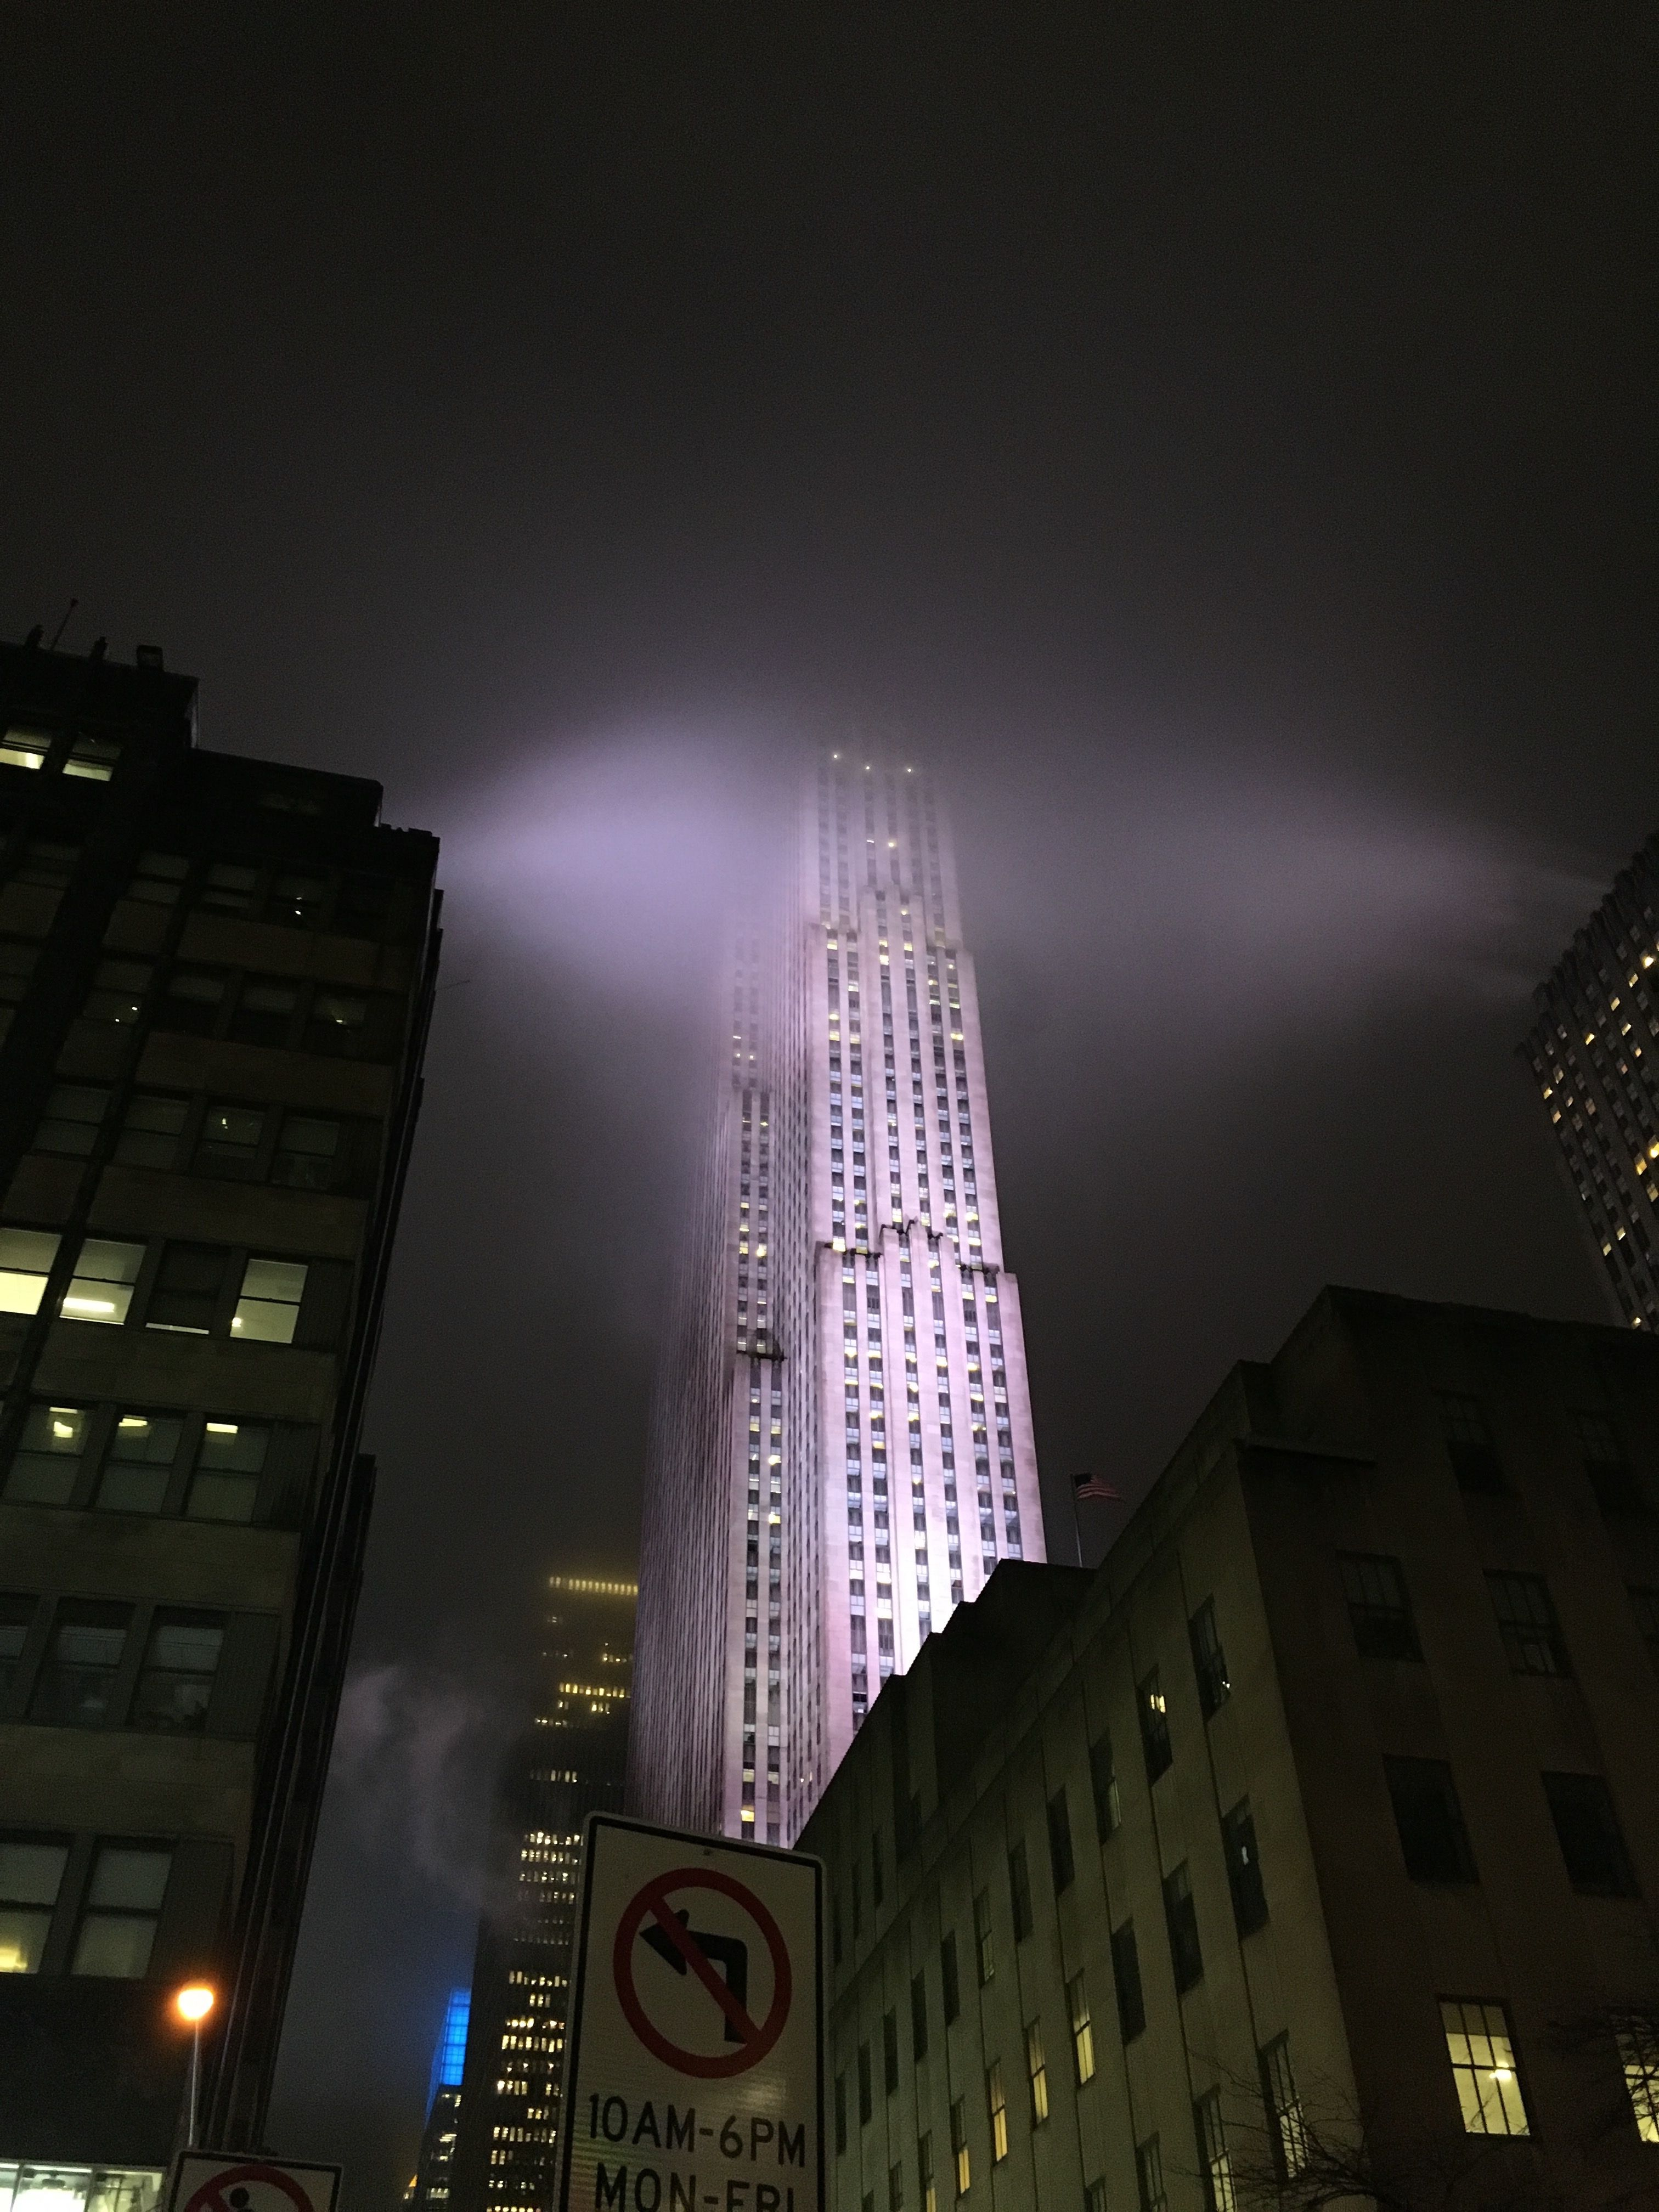 Gotham City Empire state building, Gotham city, Liberty